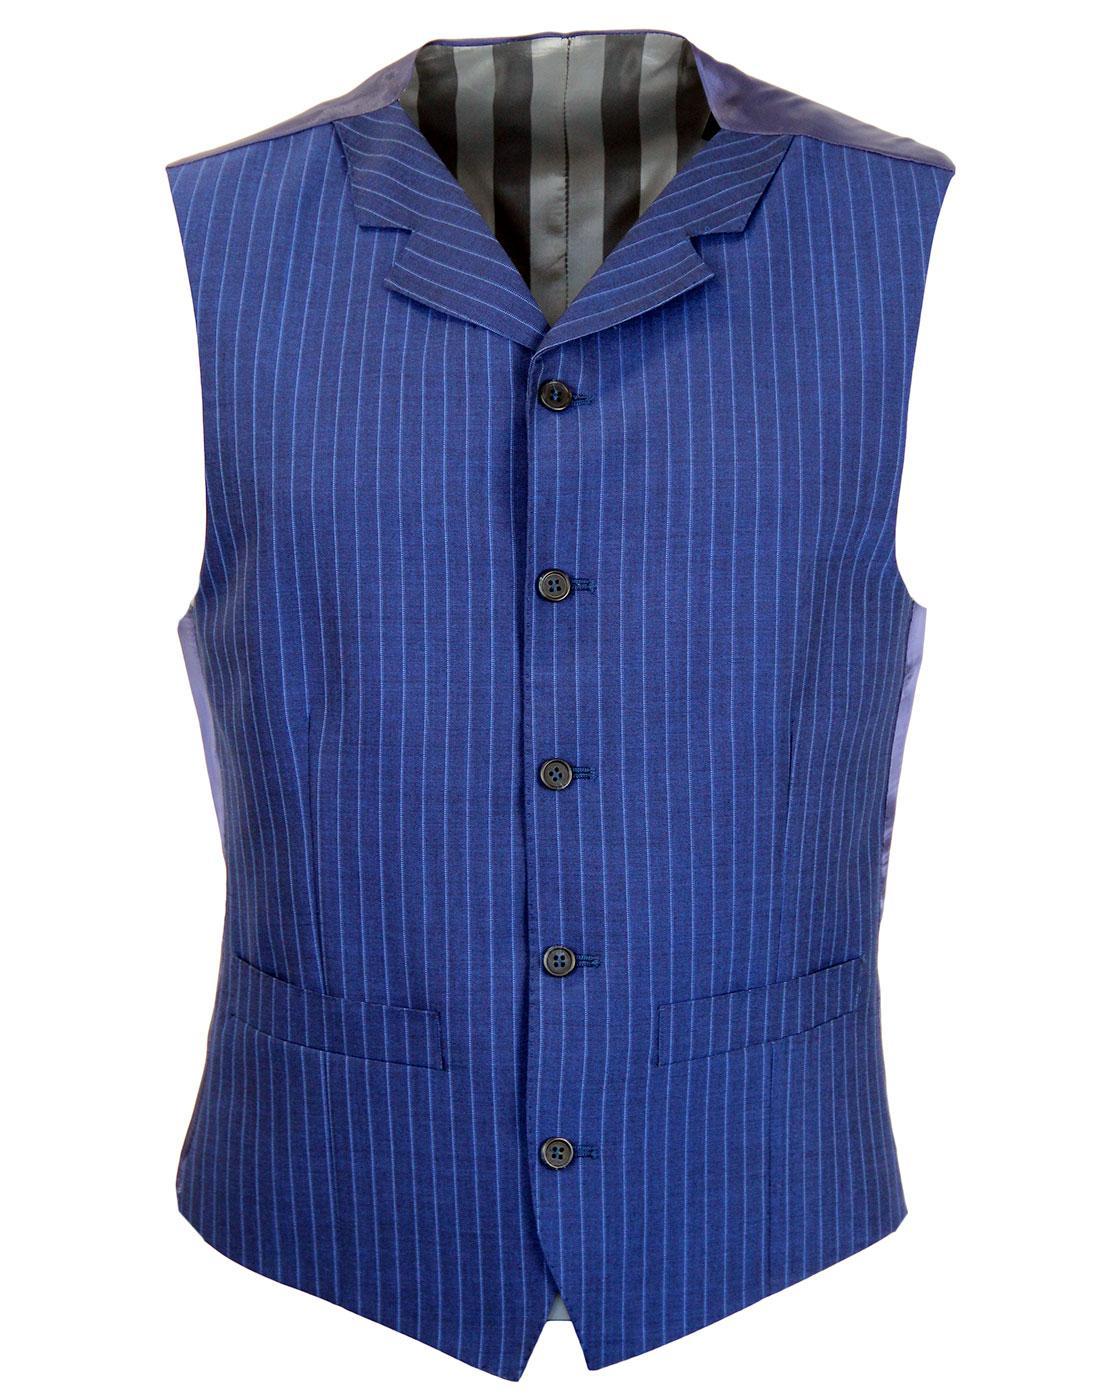 MADCAP ENGLAND Mod Pinstripe High Fasten Waistcoat